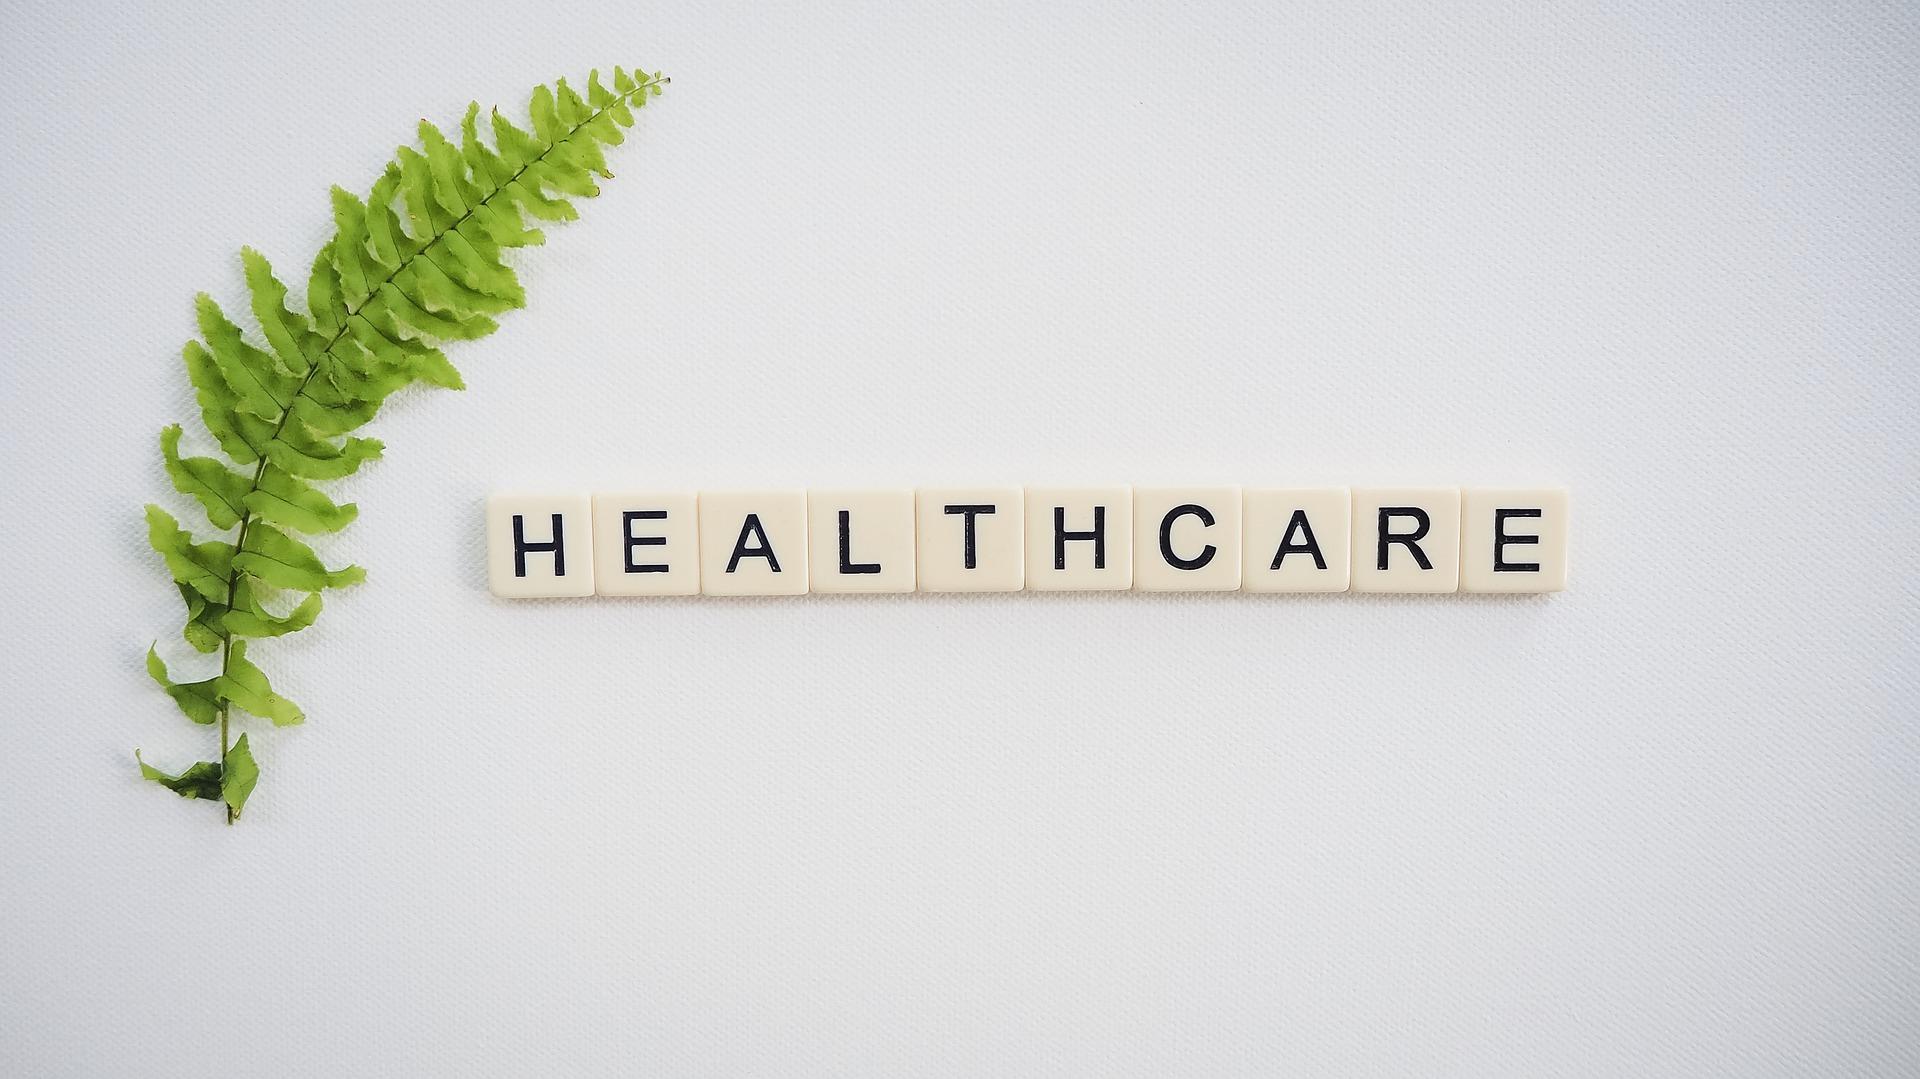 healthcare-4235817_1920